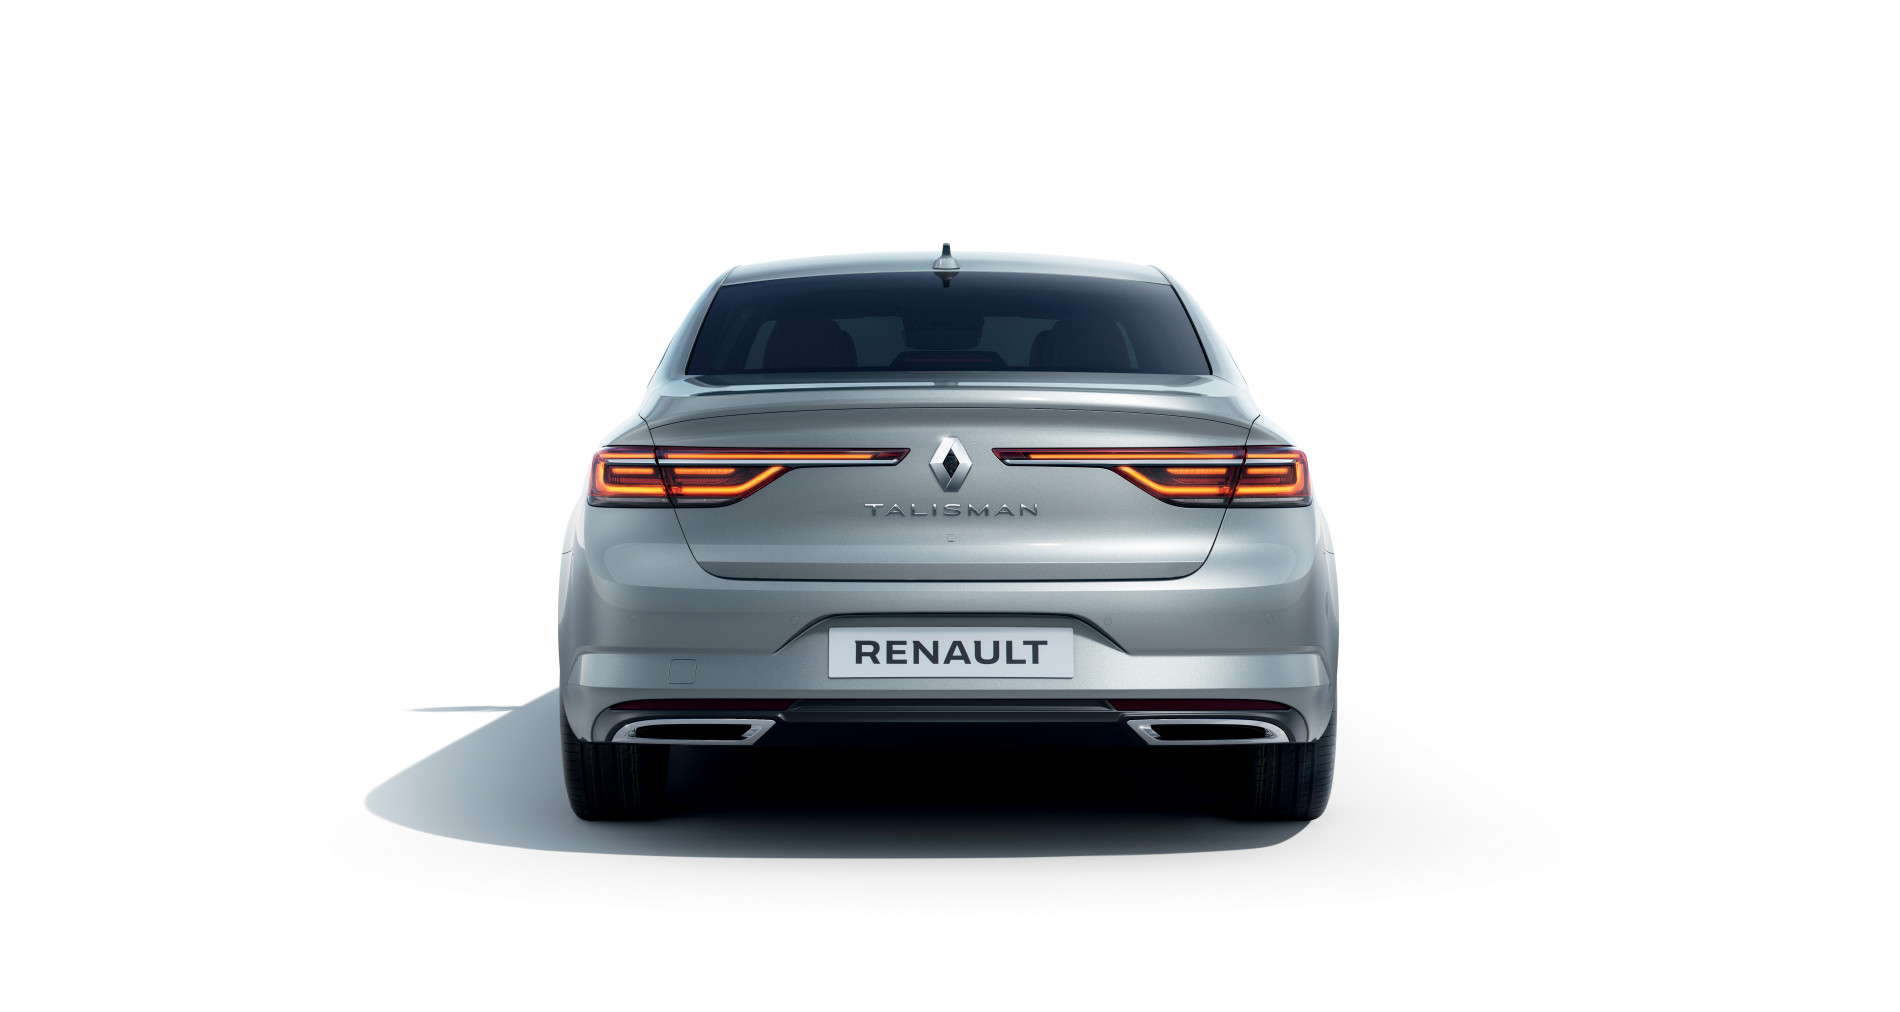 Renault Talisman Facelift - Renault Talisman Facelift